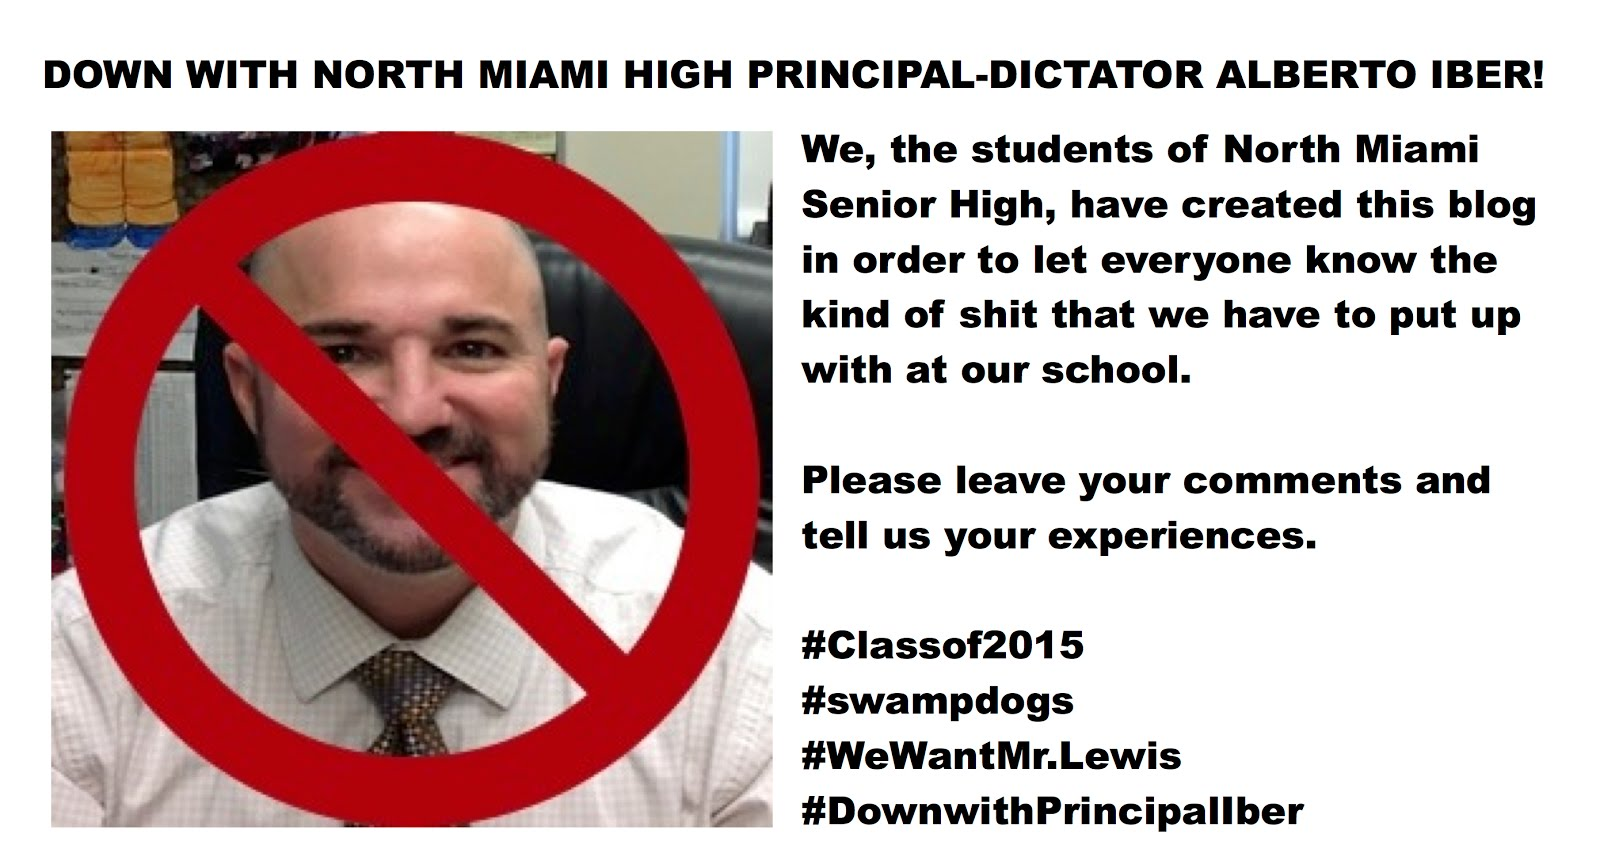 Down with North Miami High Principal-Dictator Alberto Iber